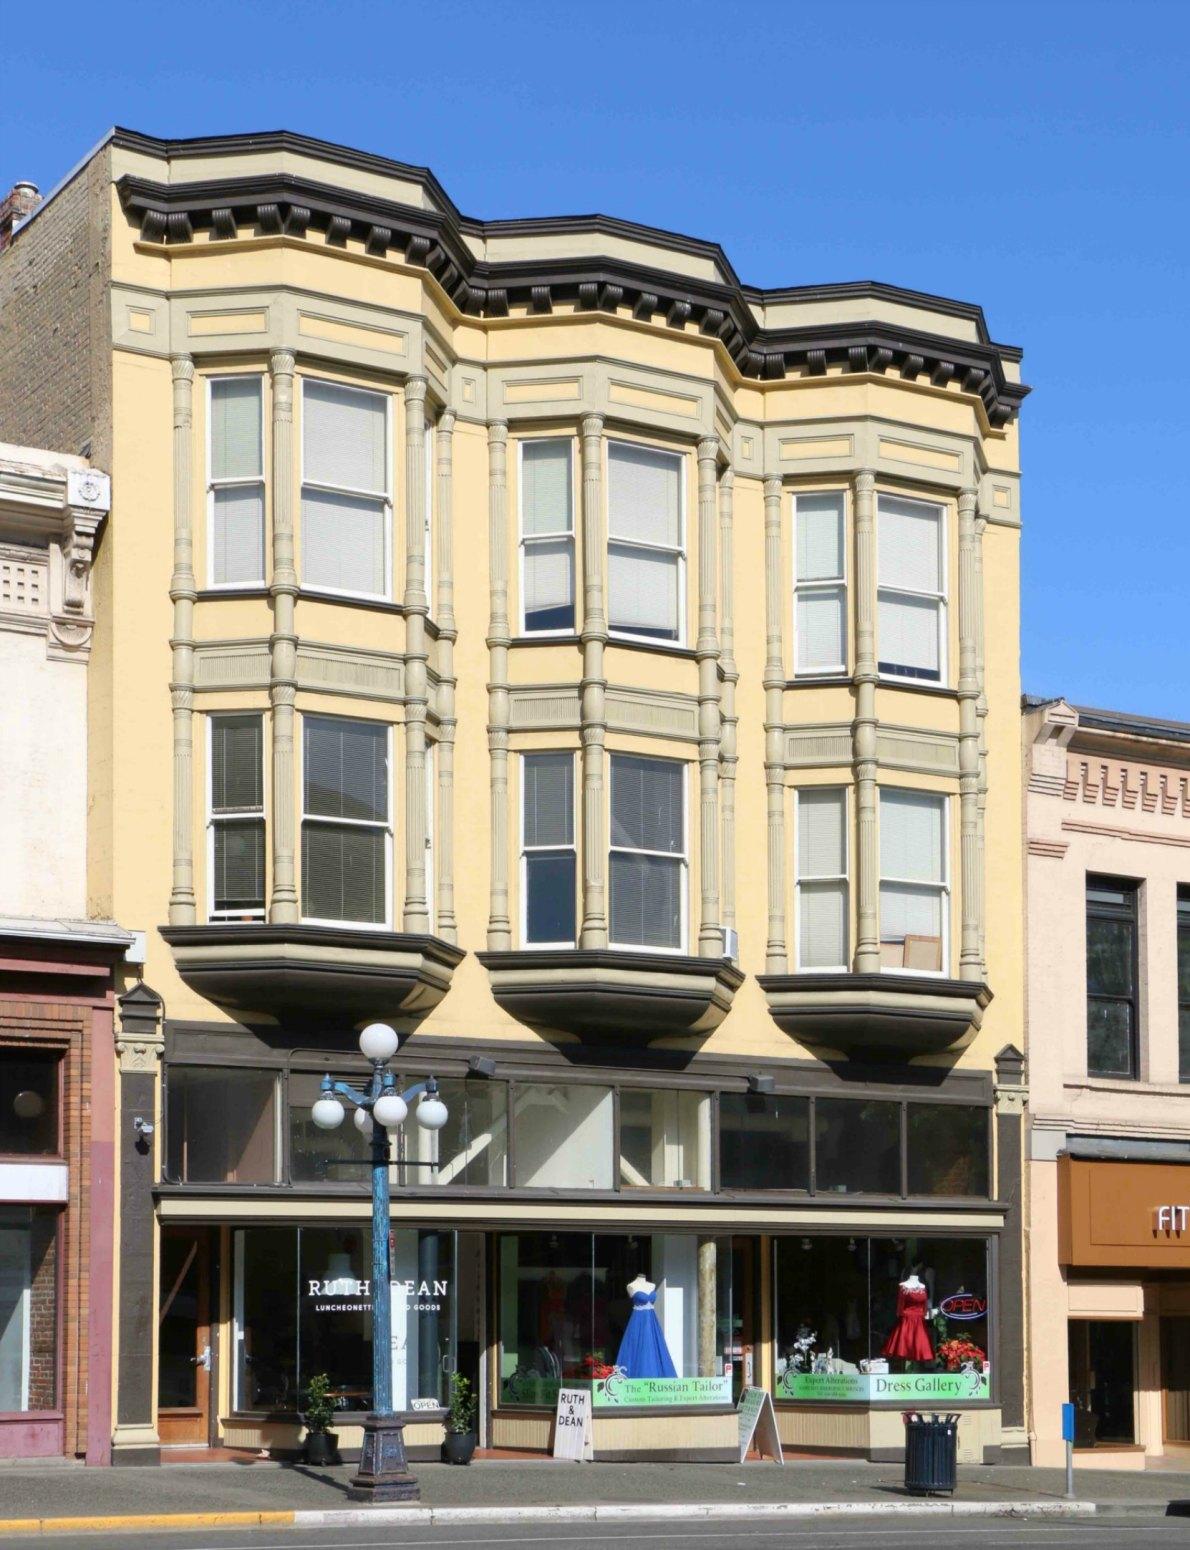 1308-1312 Douglas Street, originally built in 1891 by architect John Teague as a revenue property for Pauline E. Lange.